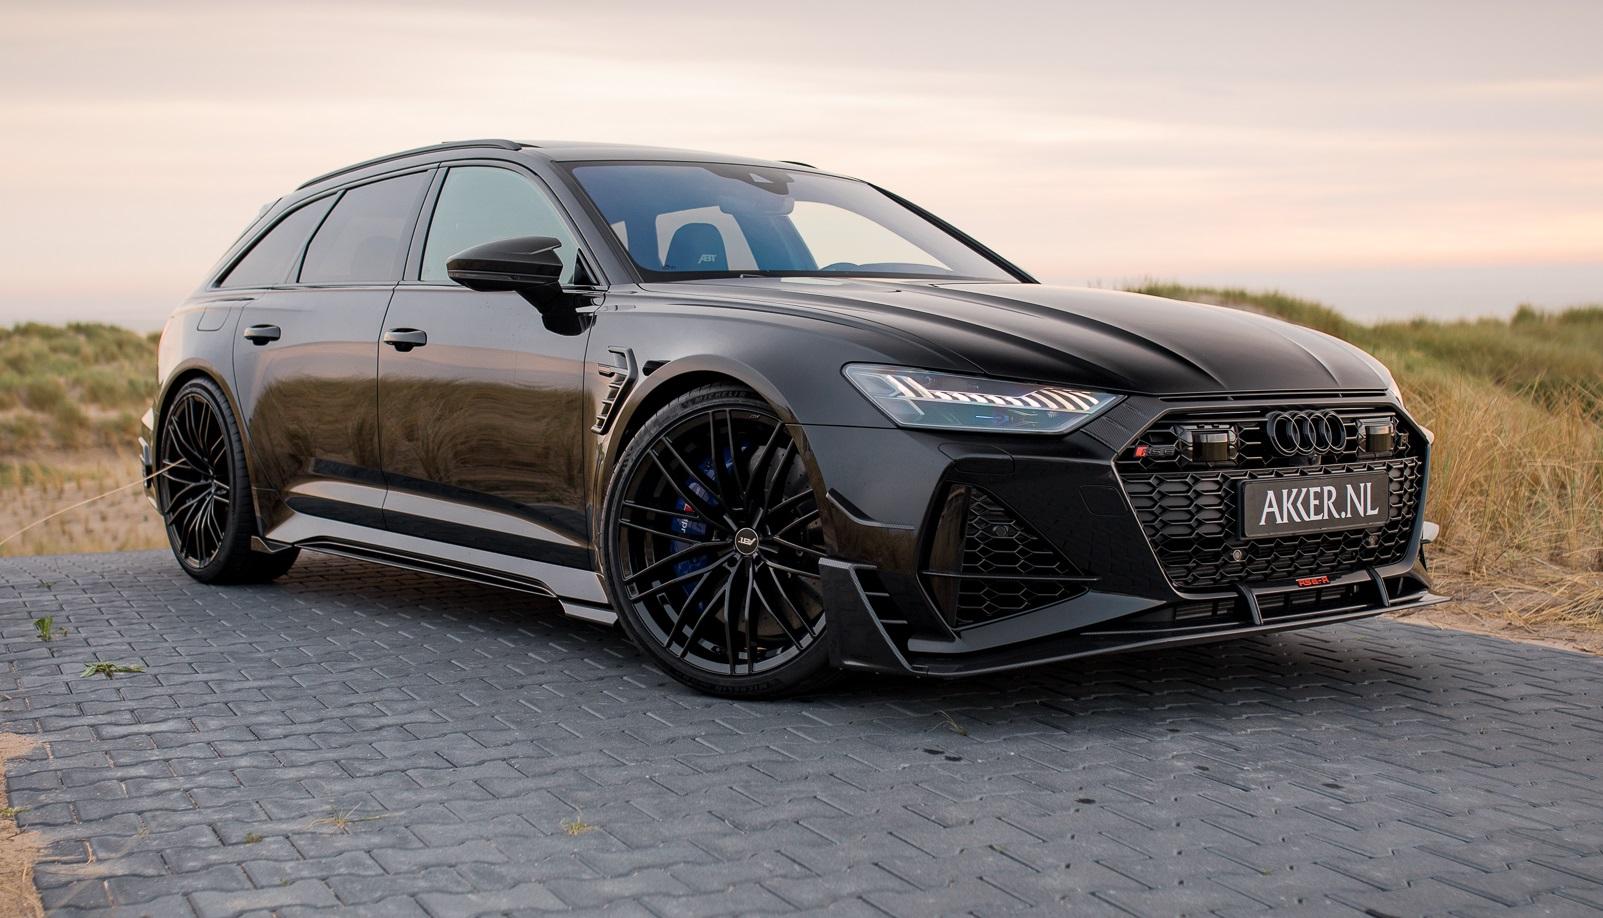 Nóg een 2020 ABT Audi RS6-R in Nederland! - Hartvoorautos.nl